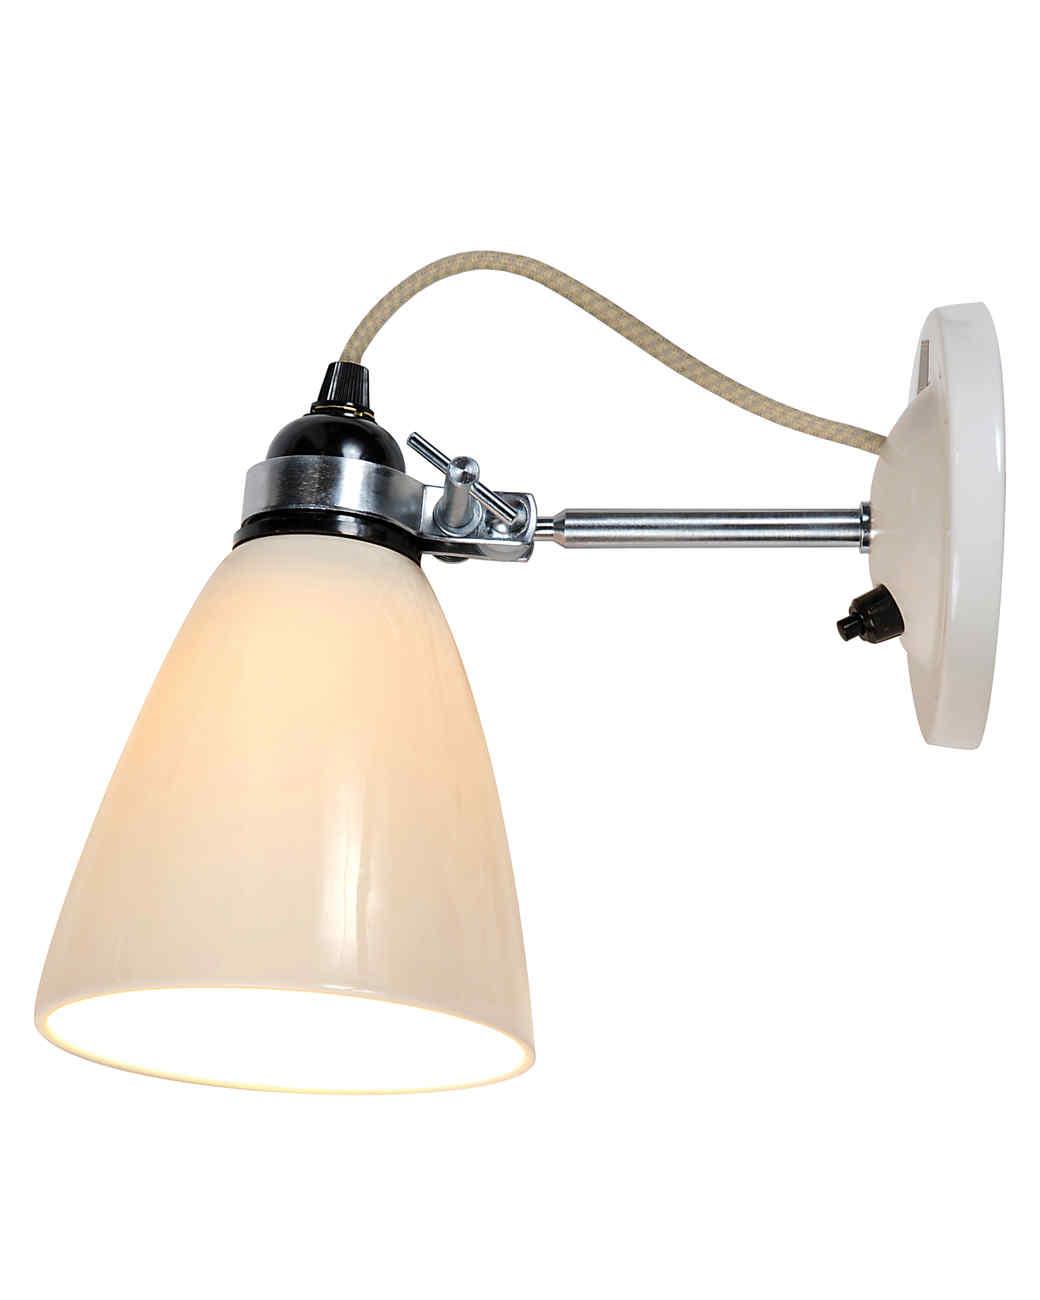 original-btc-hector-light-297-5-ms110496.jpg